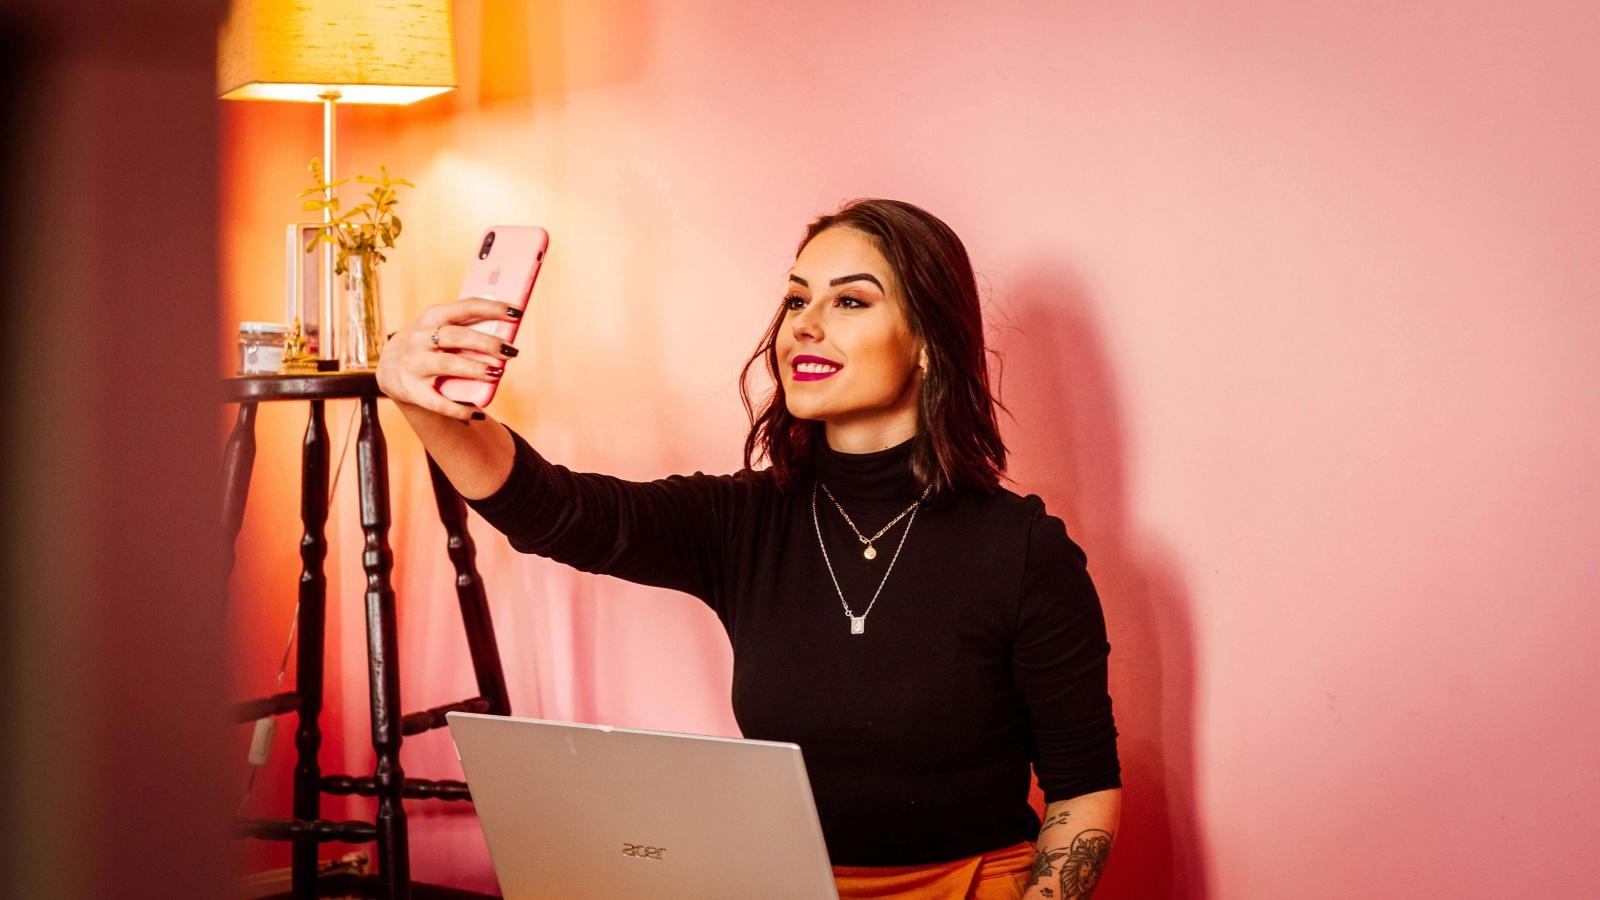 woman-holding-phone-selfie